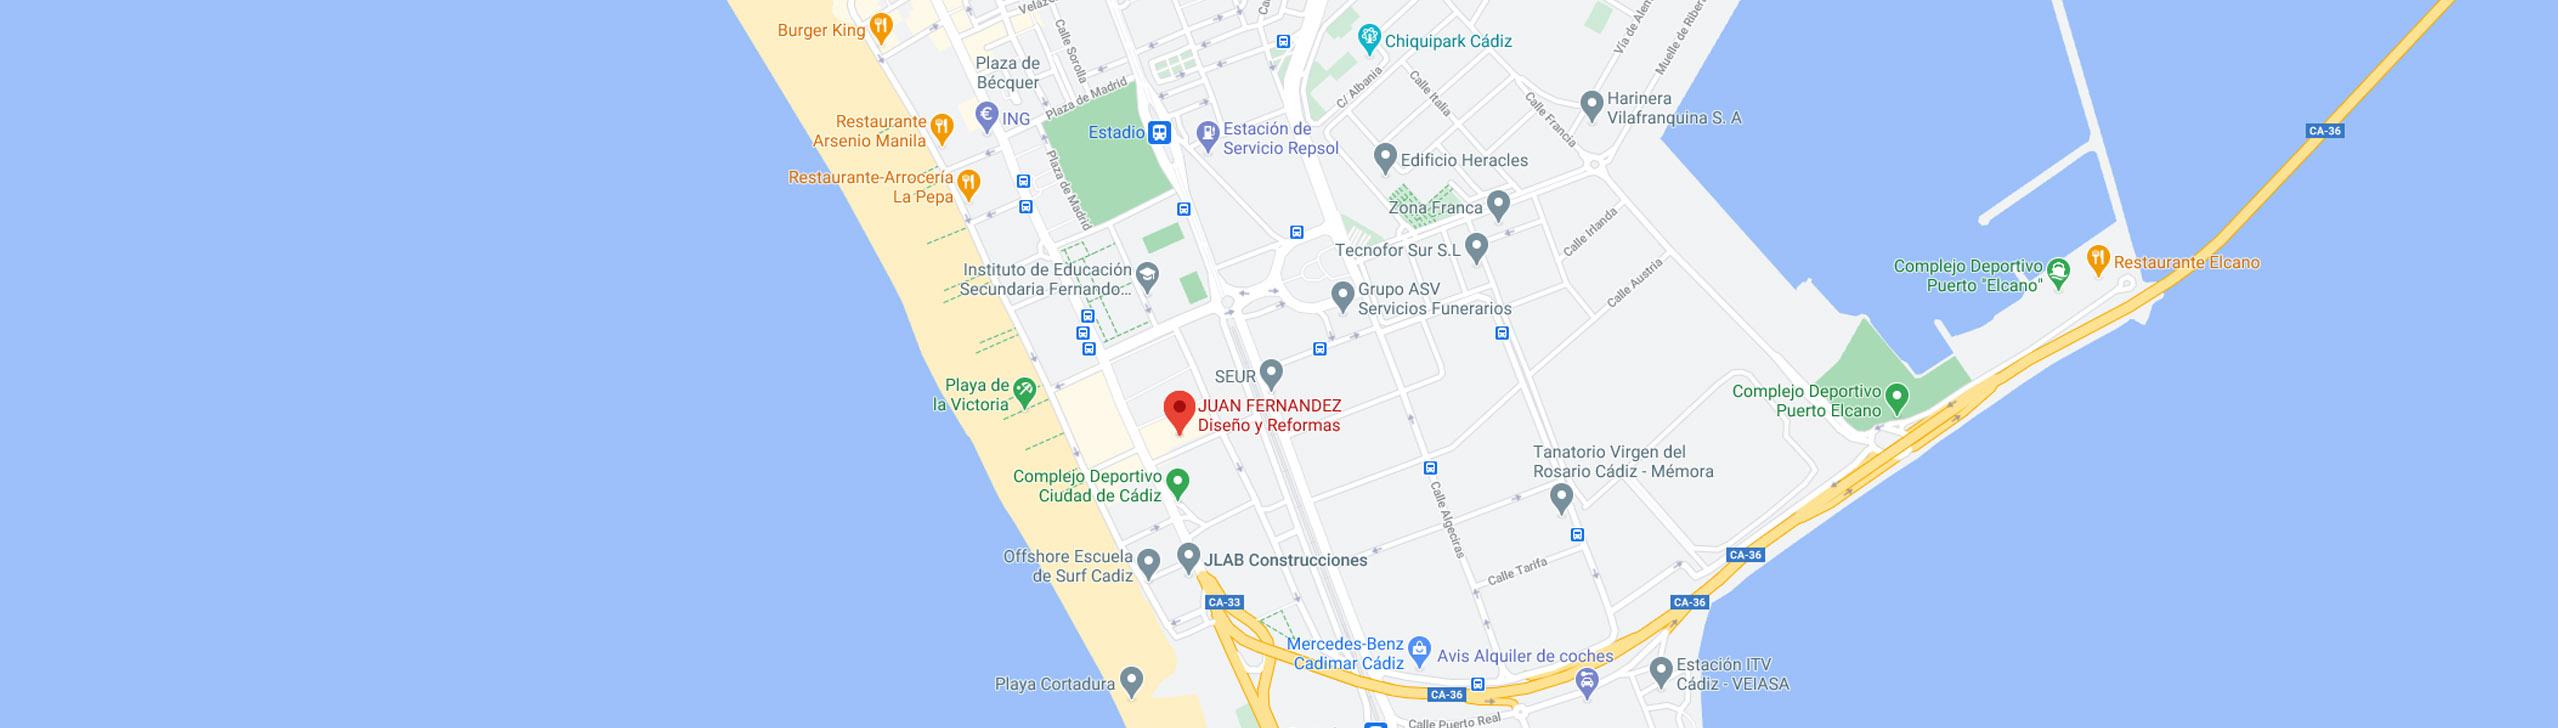 Localización Cádiz Juan Fernández